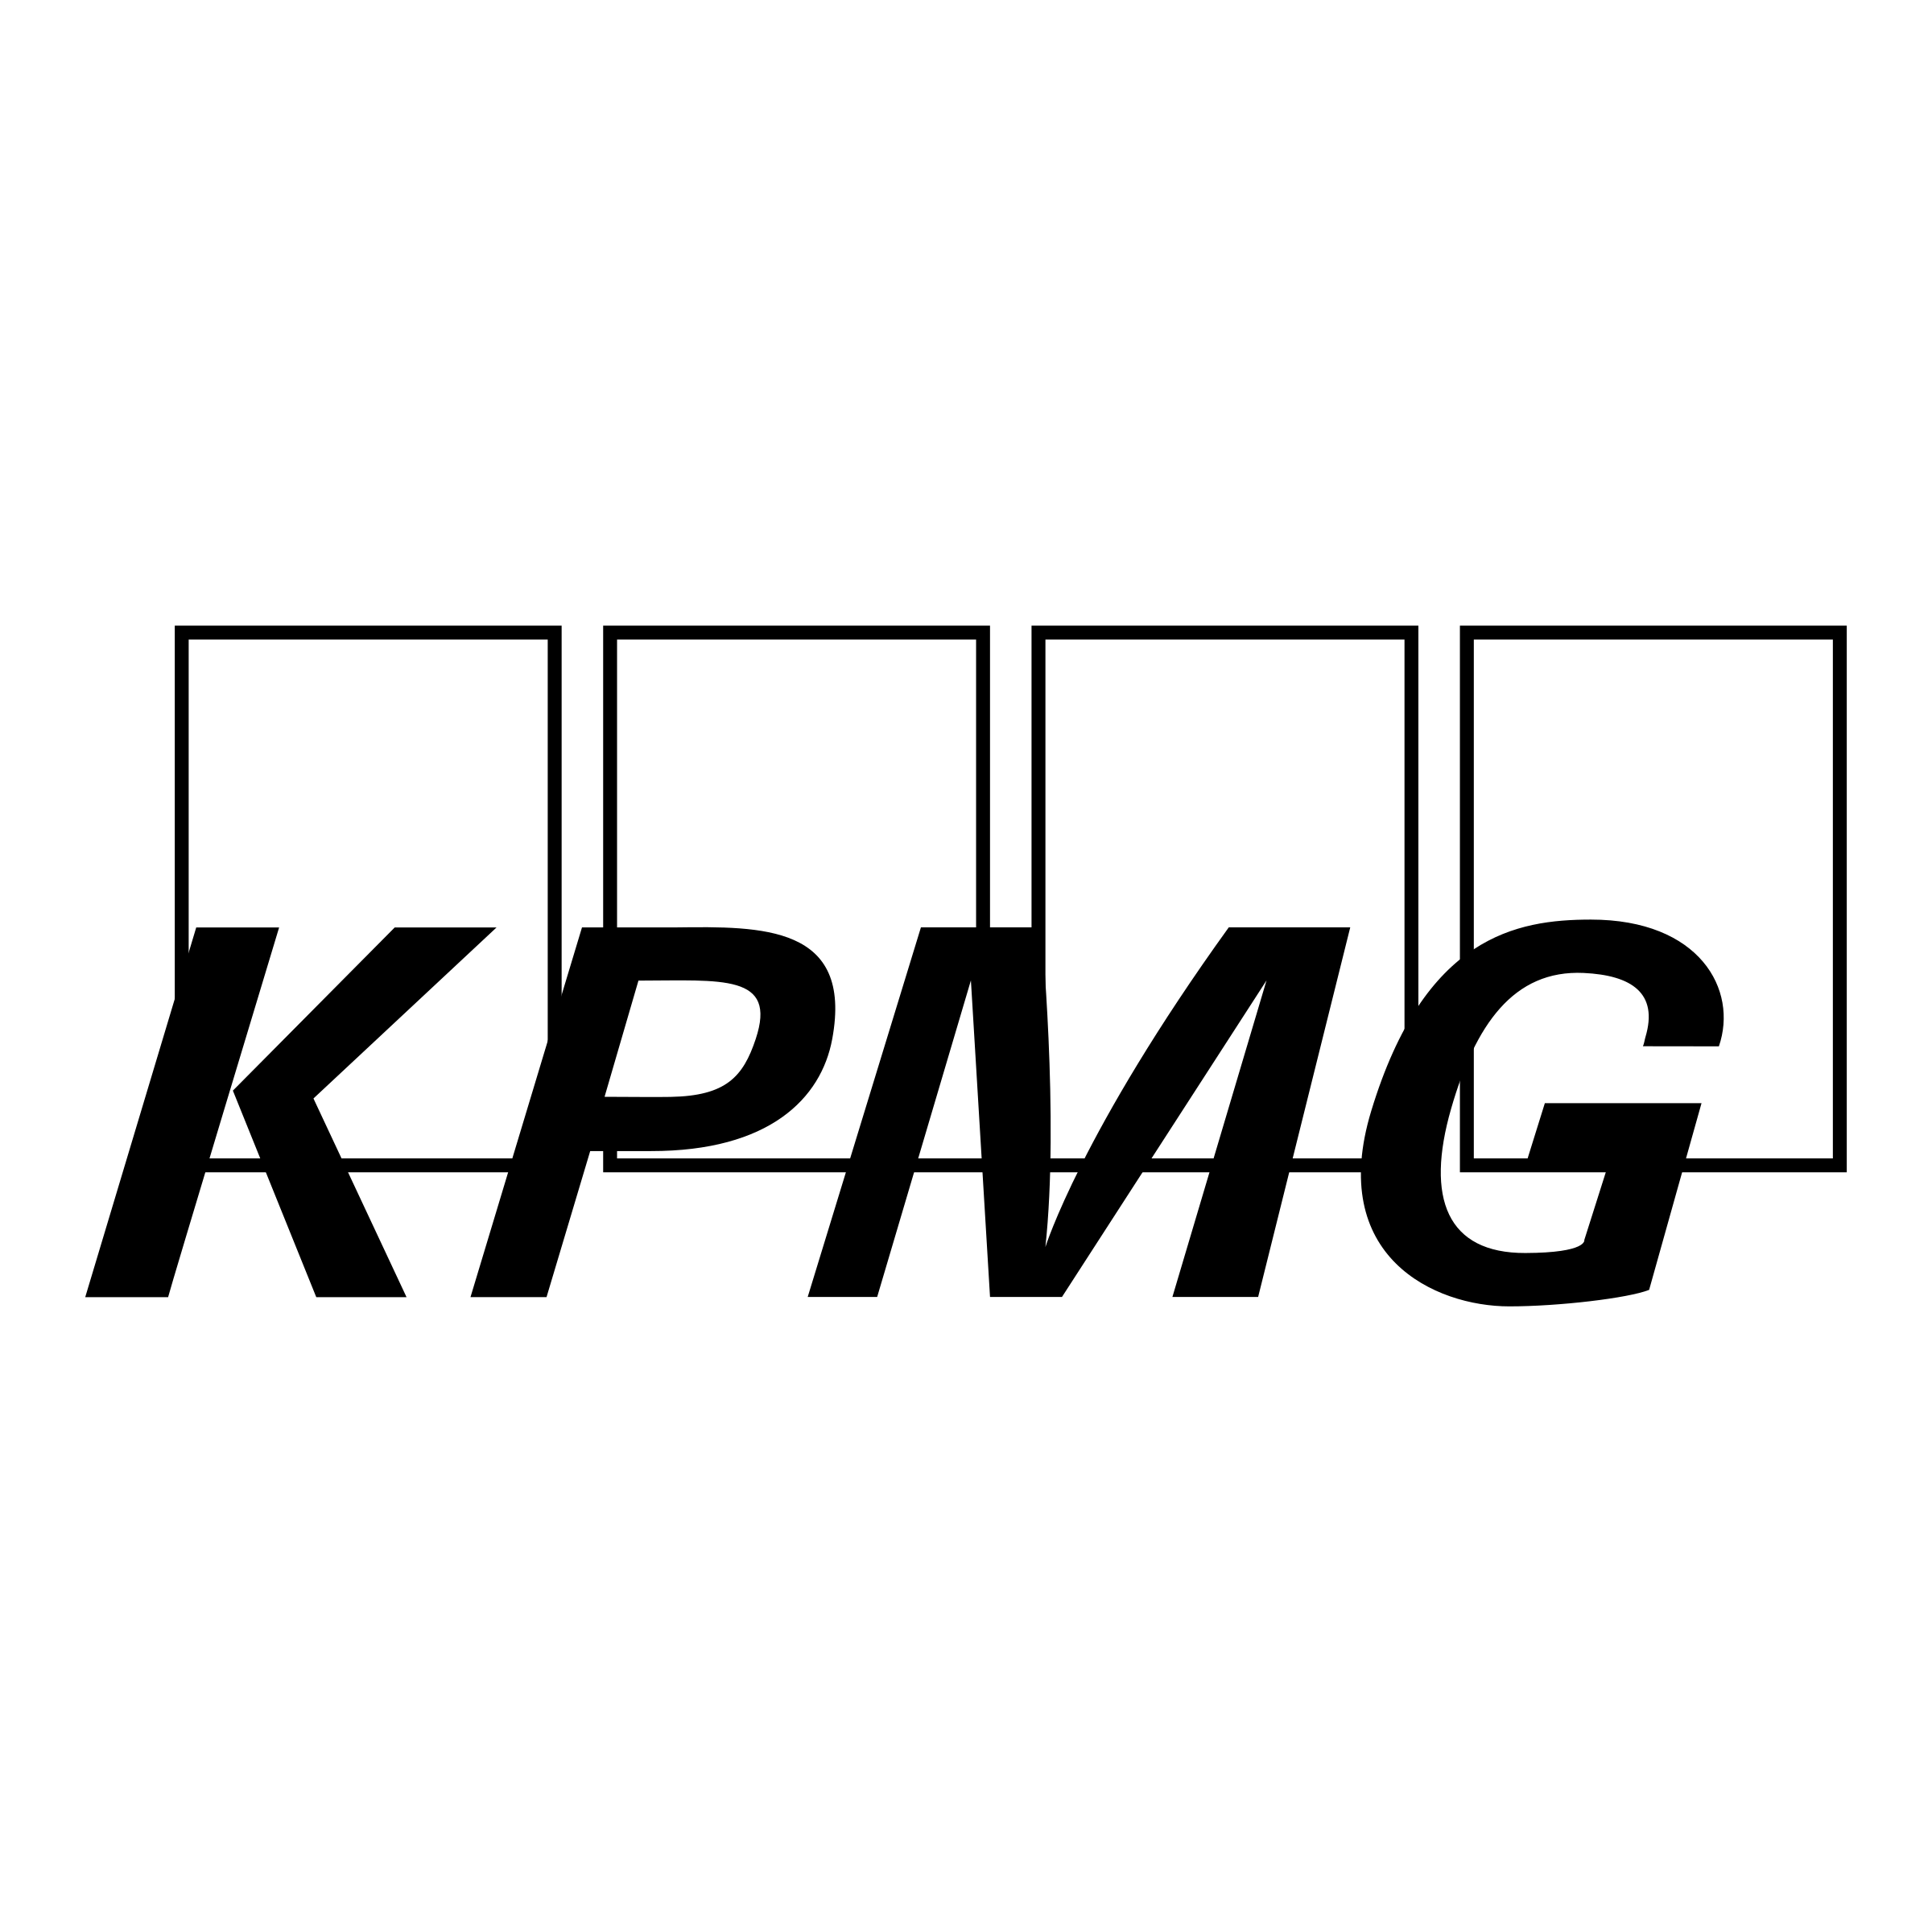 KPMG Logo PNG Transparent & SVG Vector - Freebie Supply